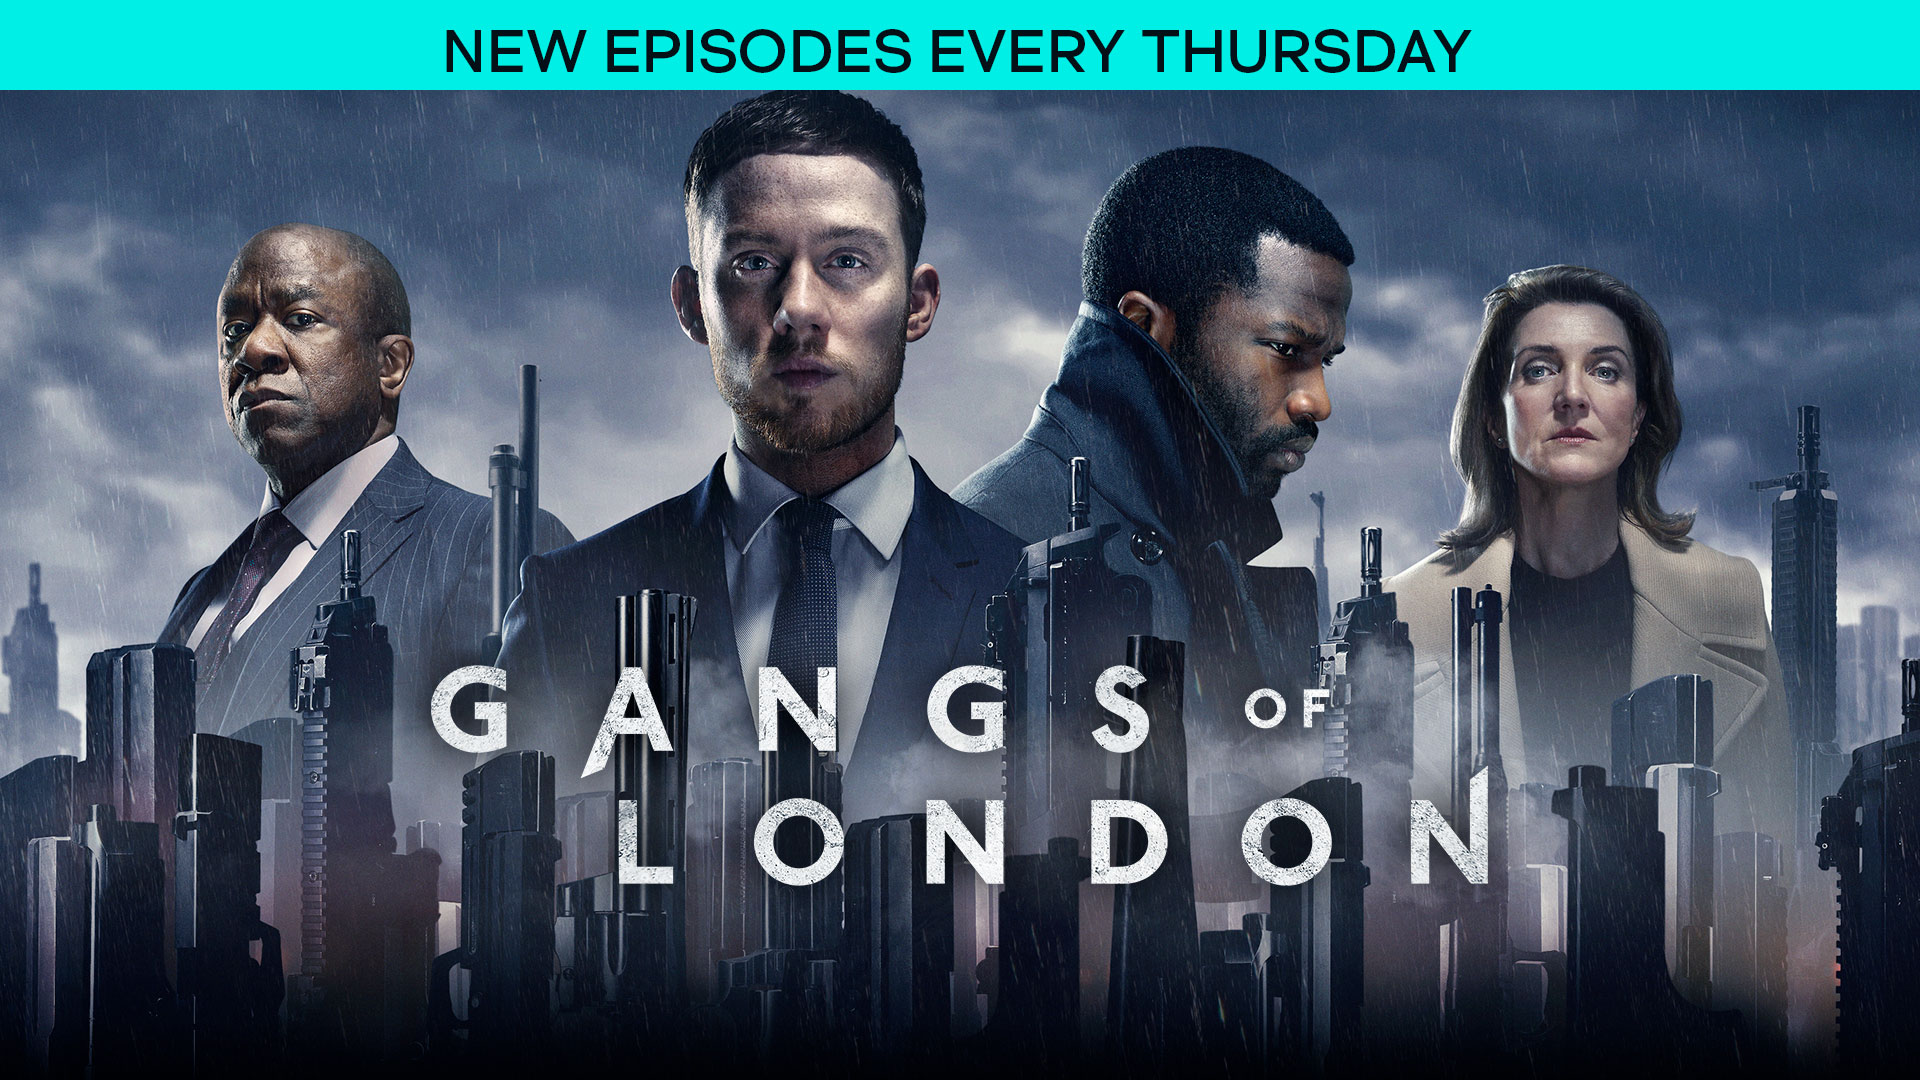 Gangs of London, Season 1